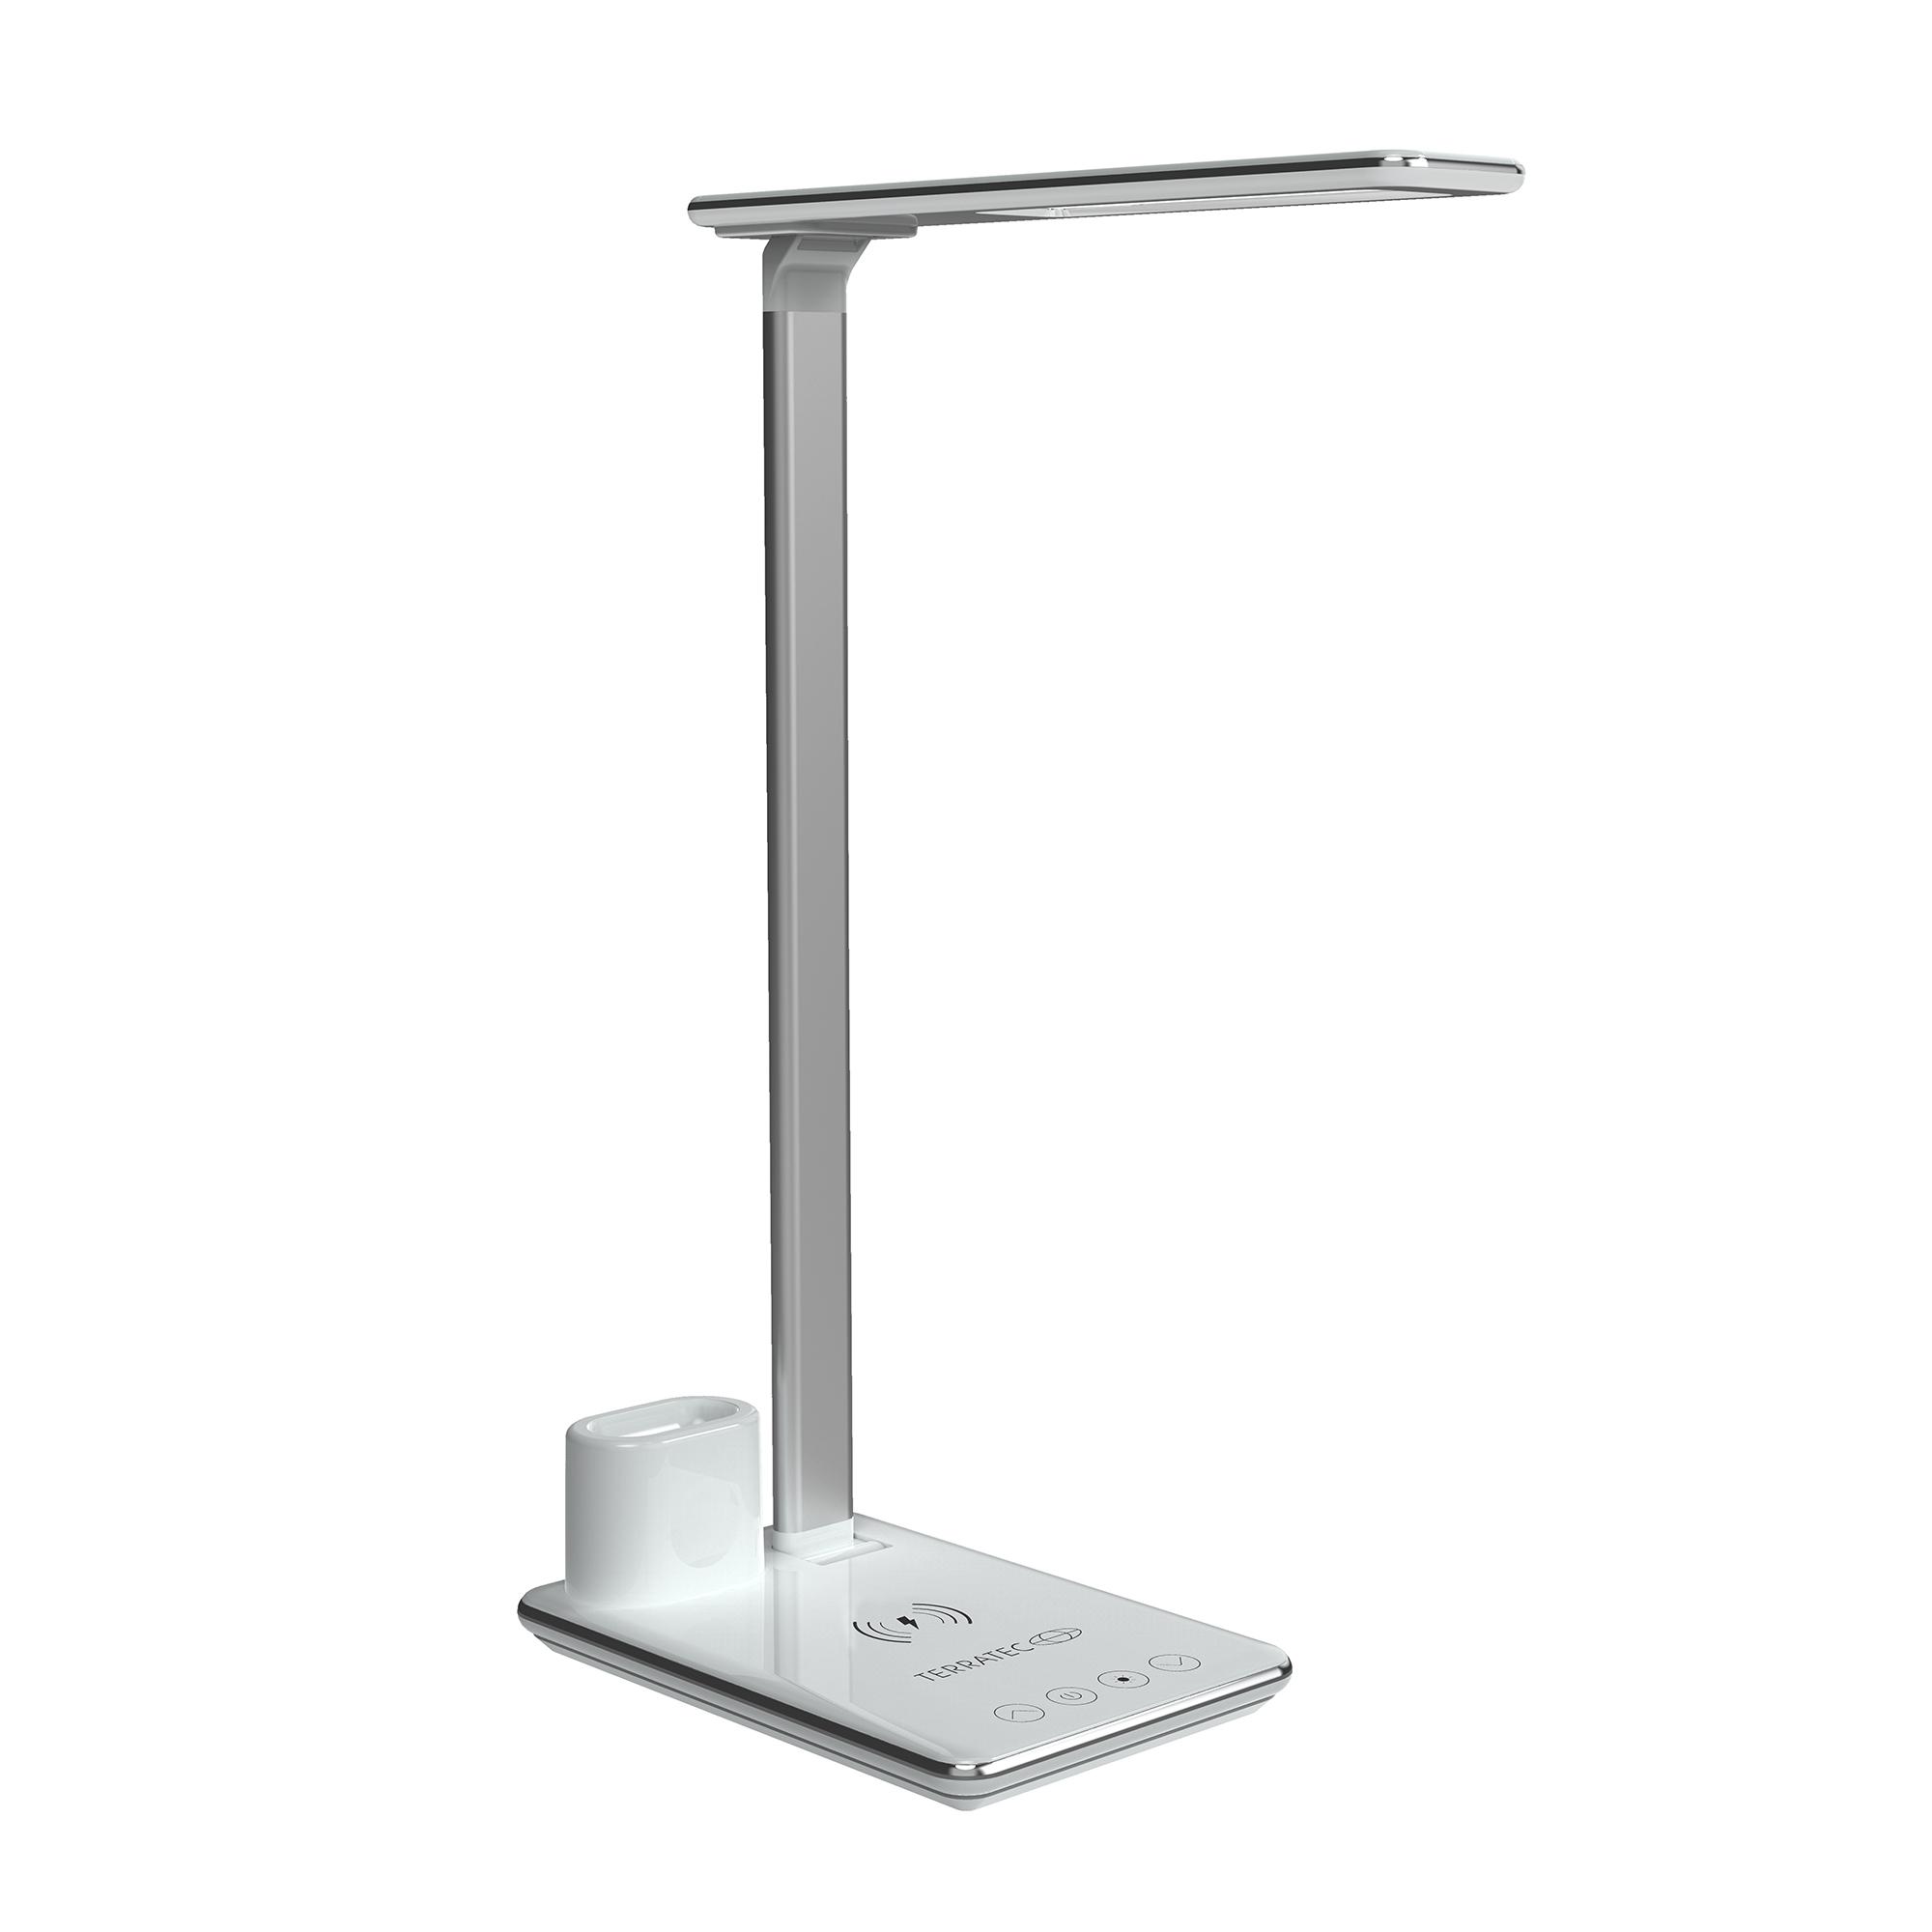 TerraTec ChargeAir All Light - Silber - Homeoffice - Büro - China - CE - 1 Glühbirne(n) - 5 W